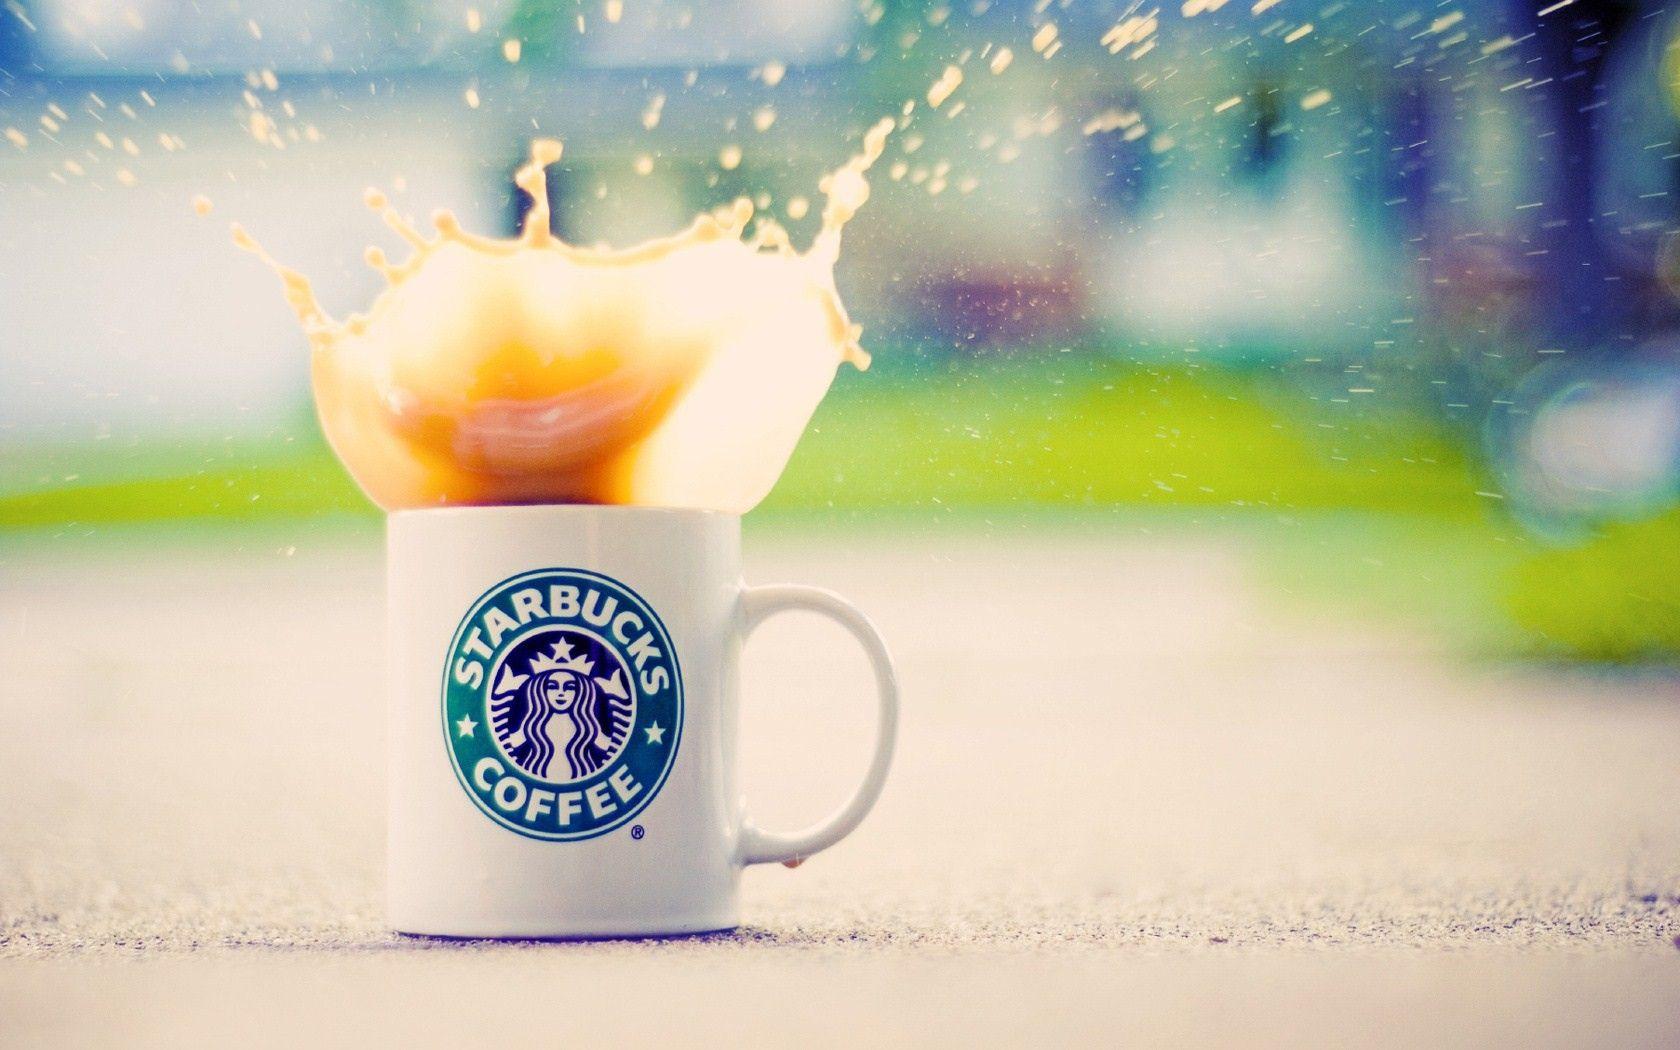 Hd wallpaper whatsapp - Starbucks Coffee Cup Hd Wallpaper Whatsapp And Facebook